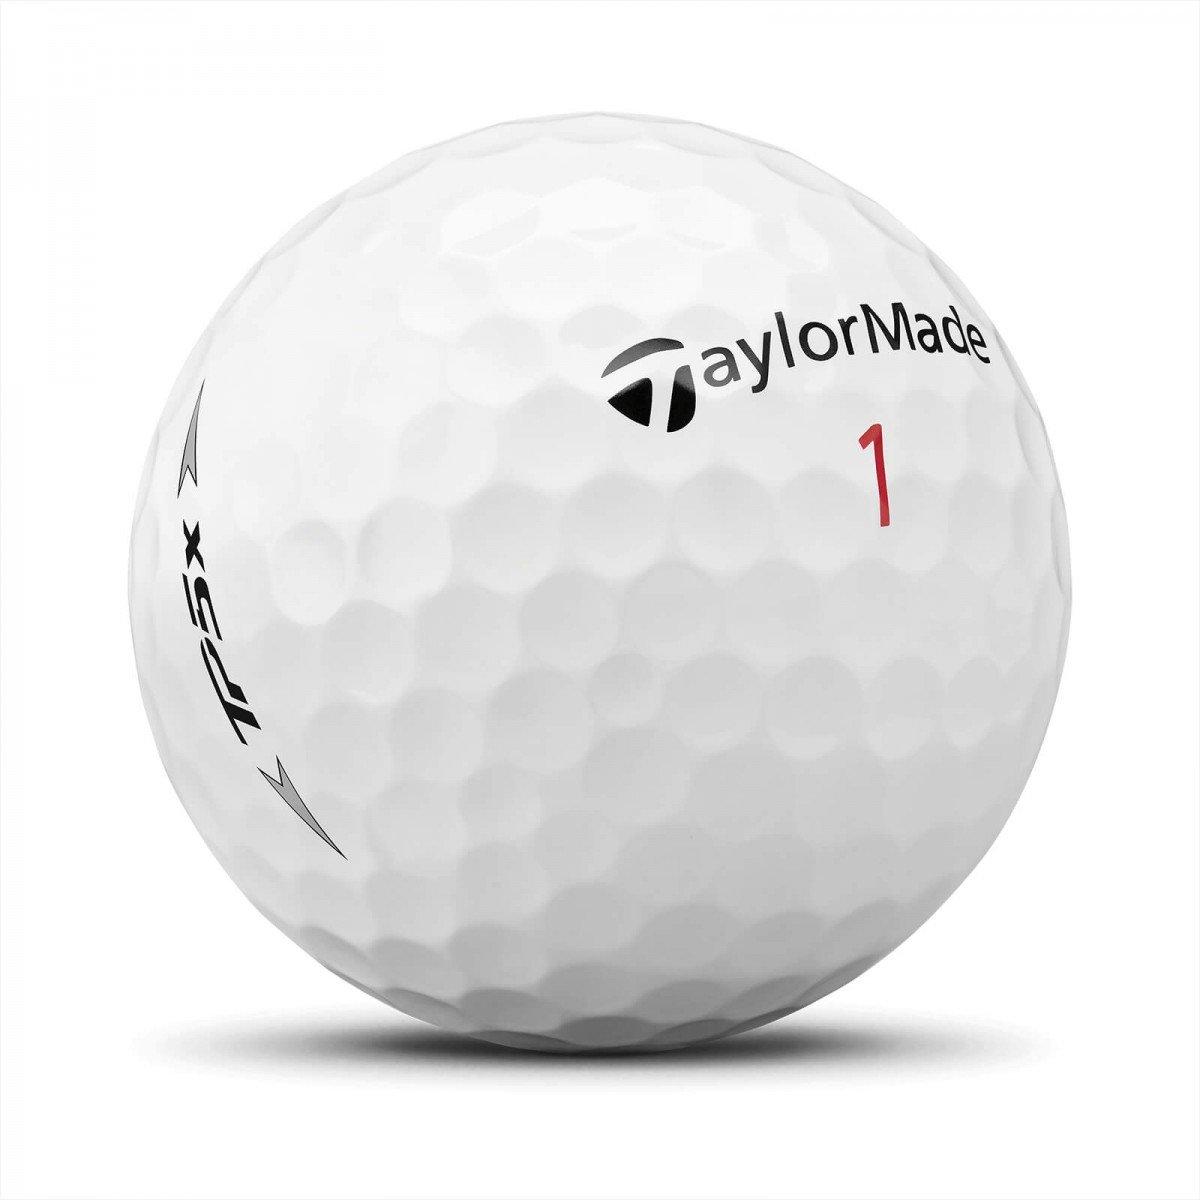 NEW TaylorMade TP5x Golf Ball